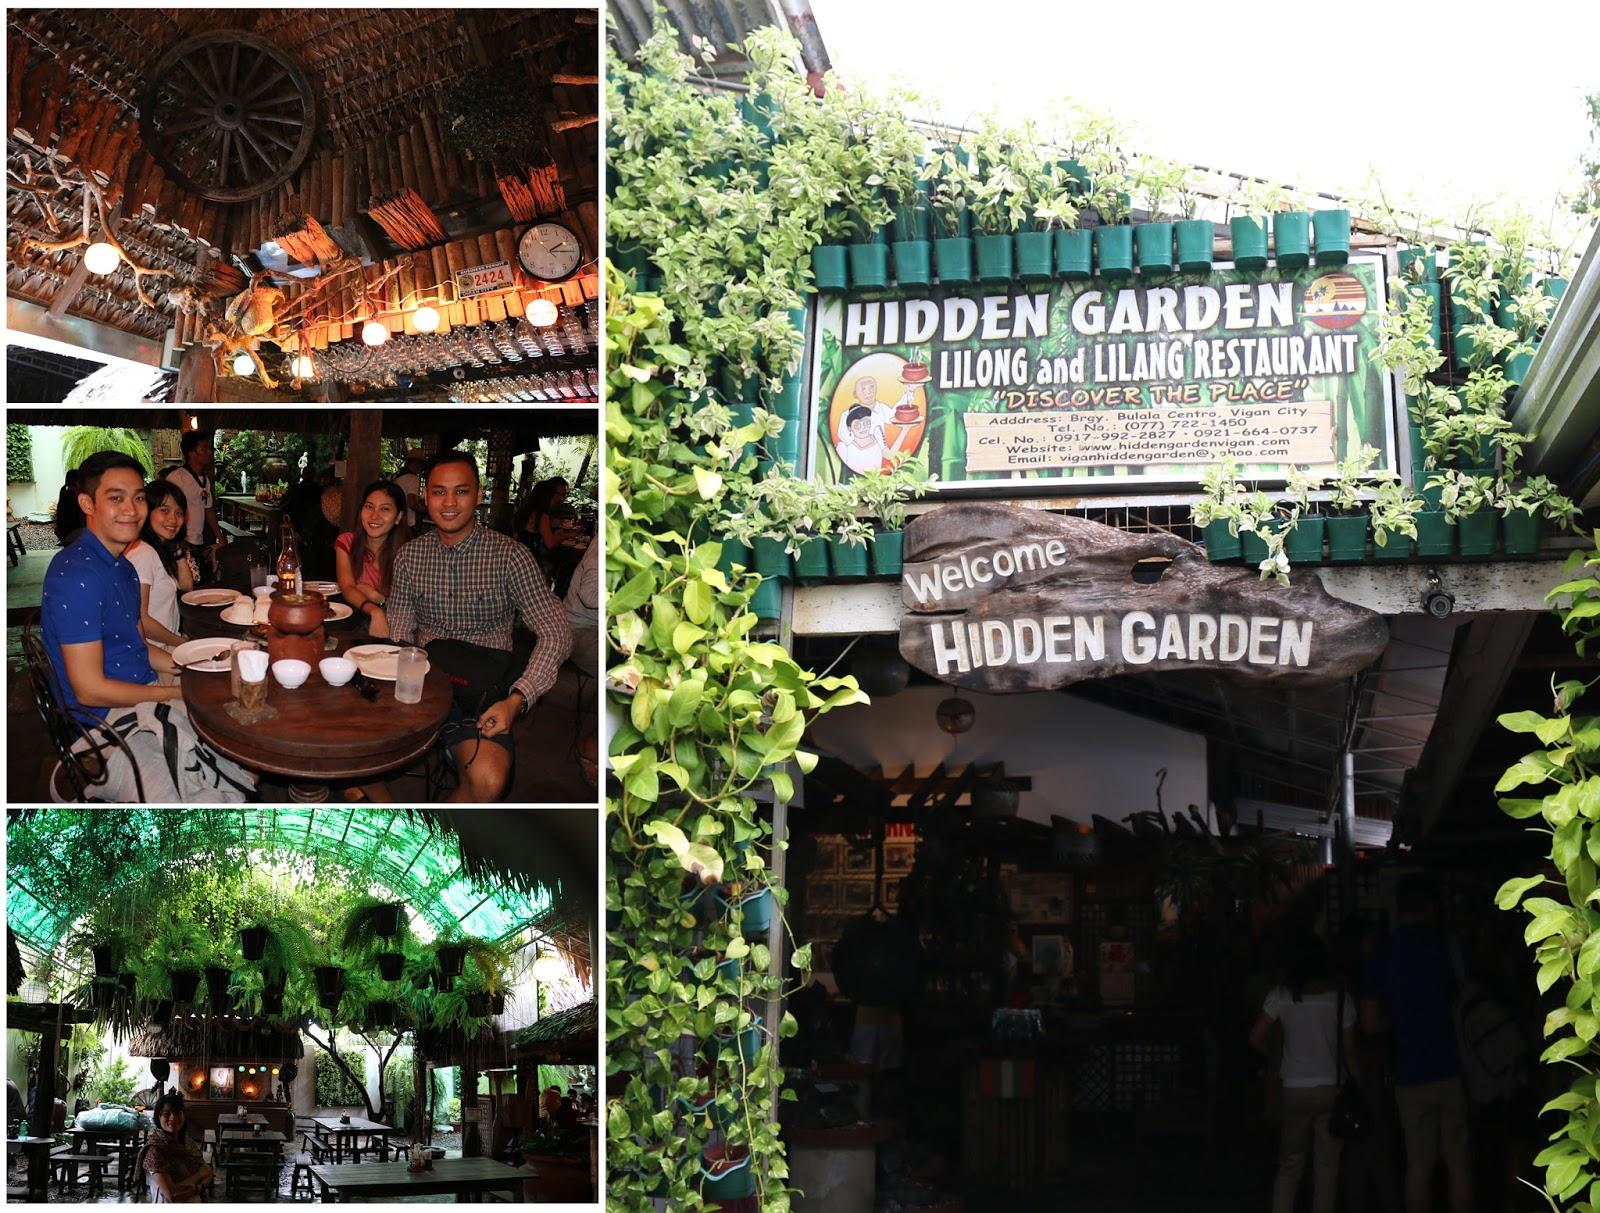 travel Vigan Ilocos Tour Sur Philippines tour tourism Hidden Garden restaurant